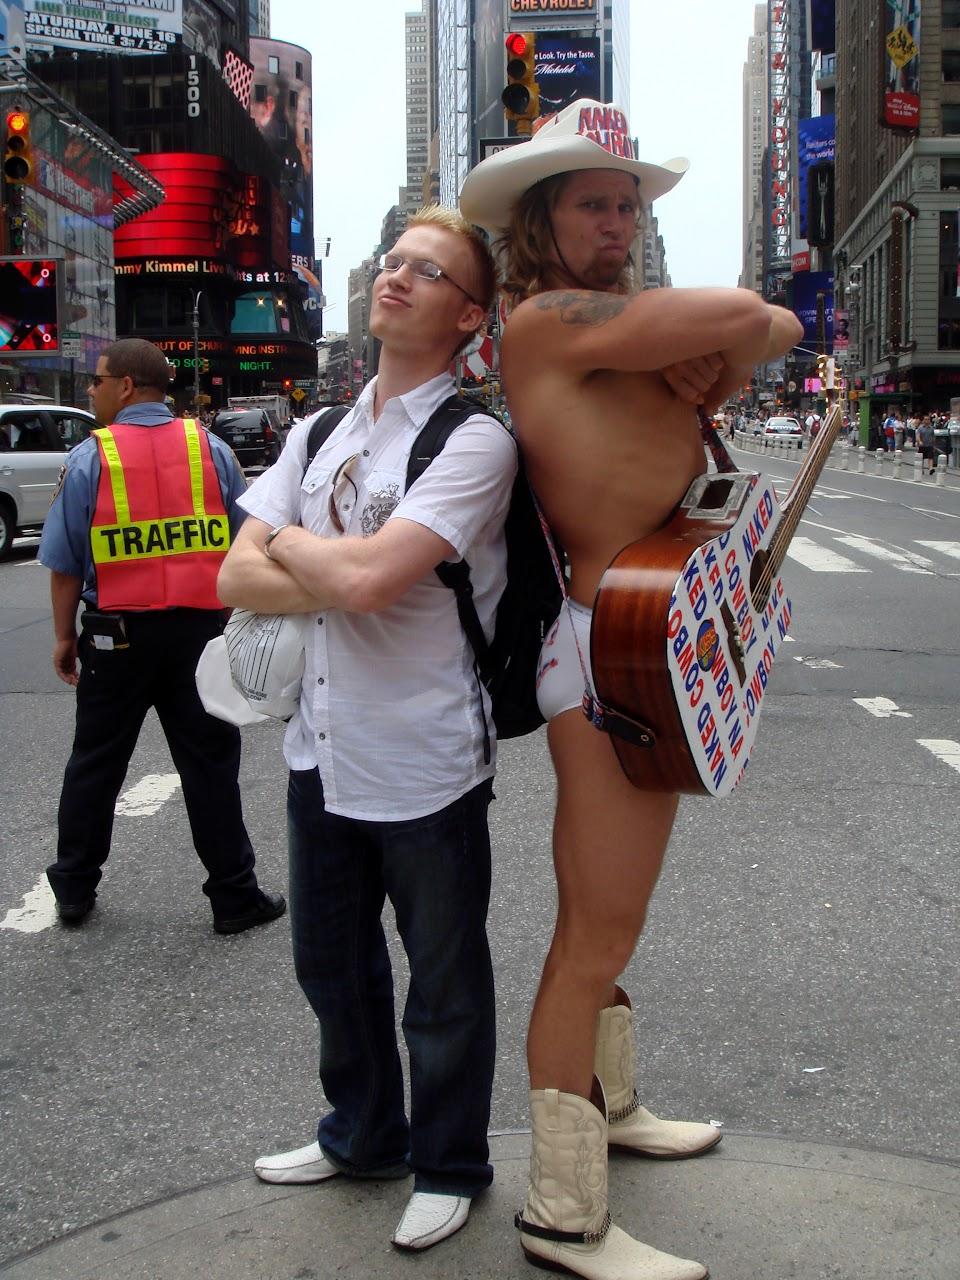 Celeb New York Naked Cow Boy Jpg